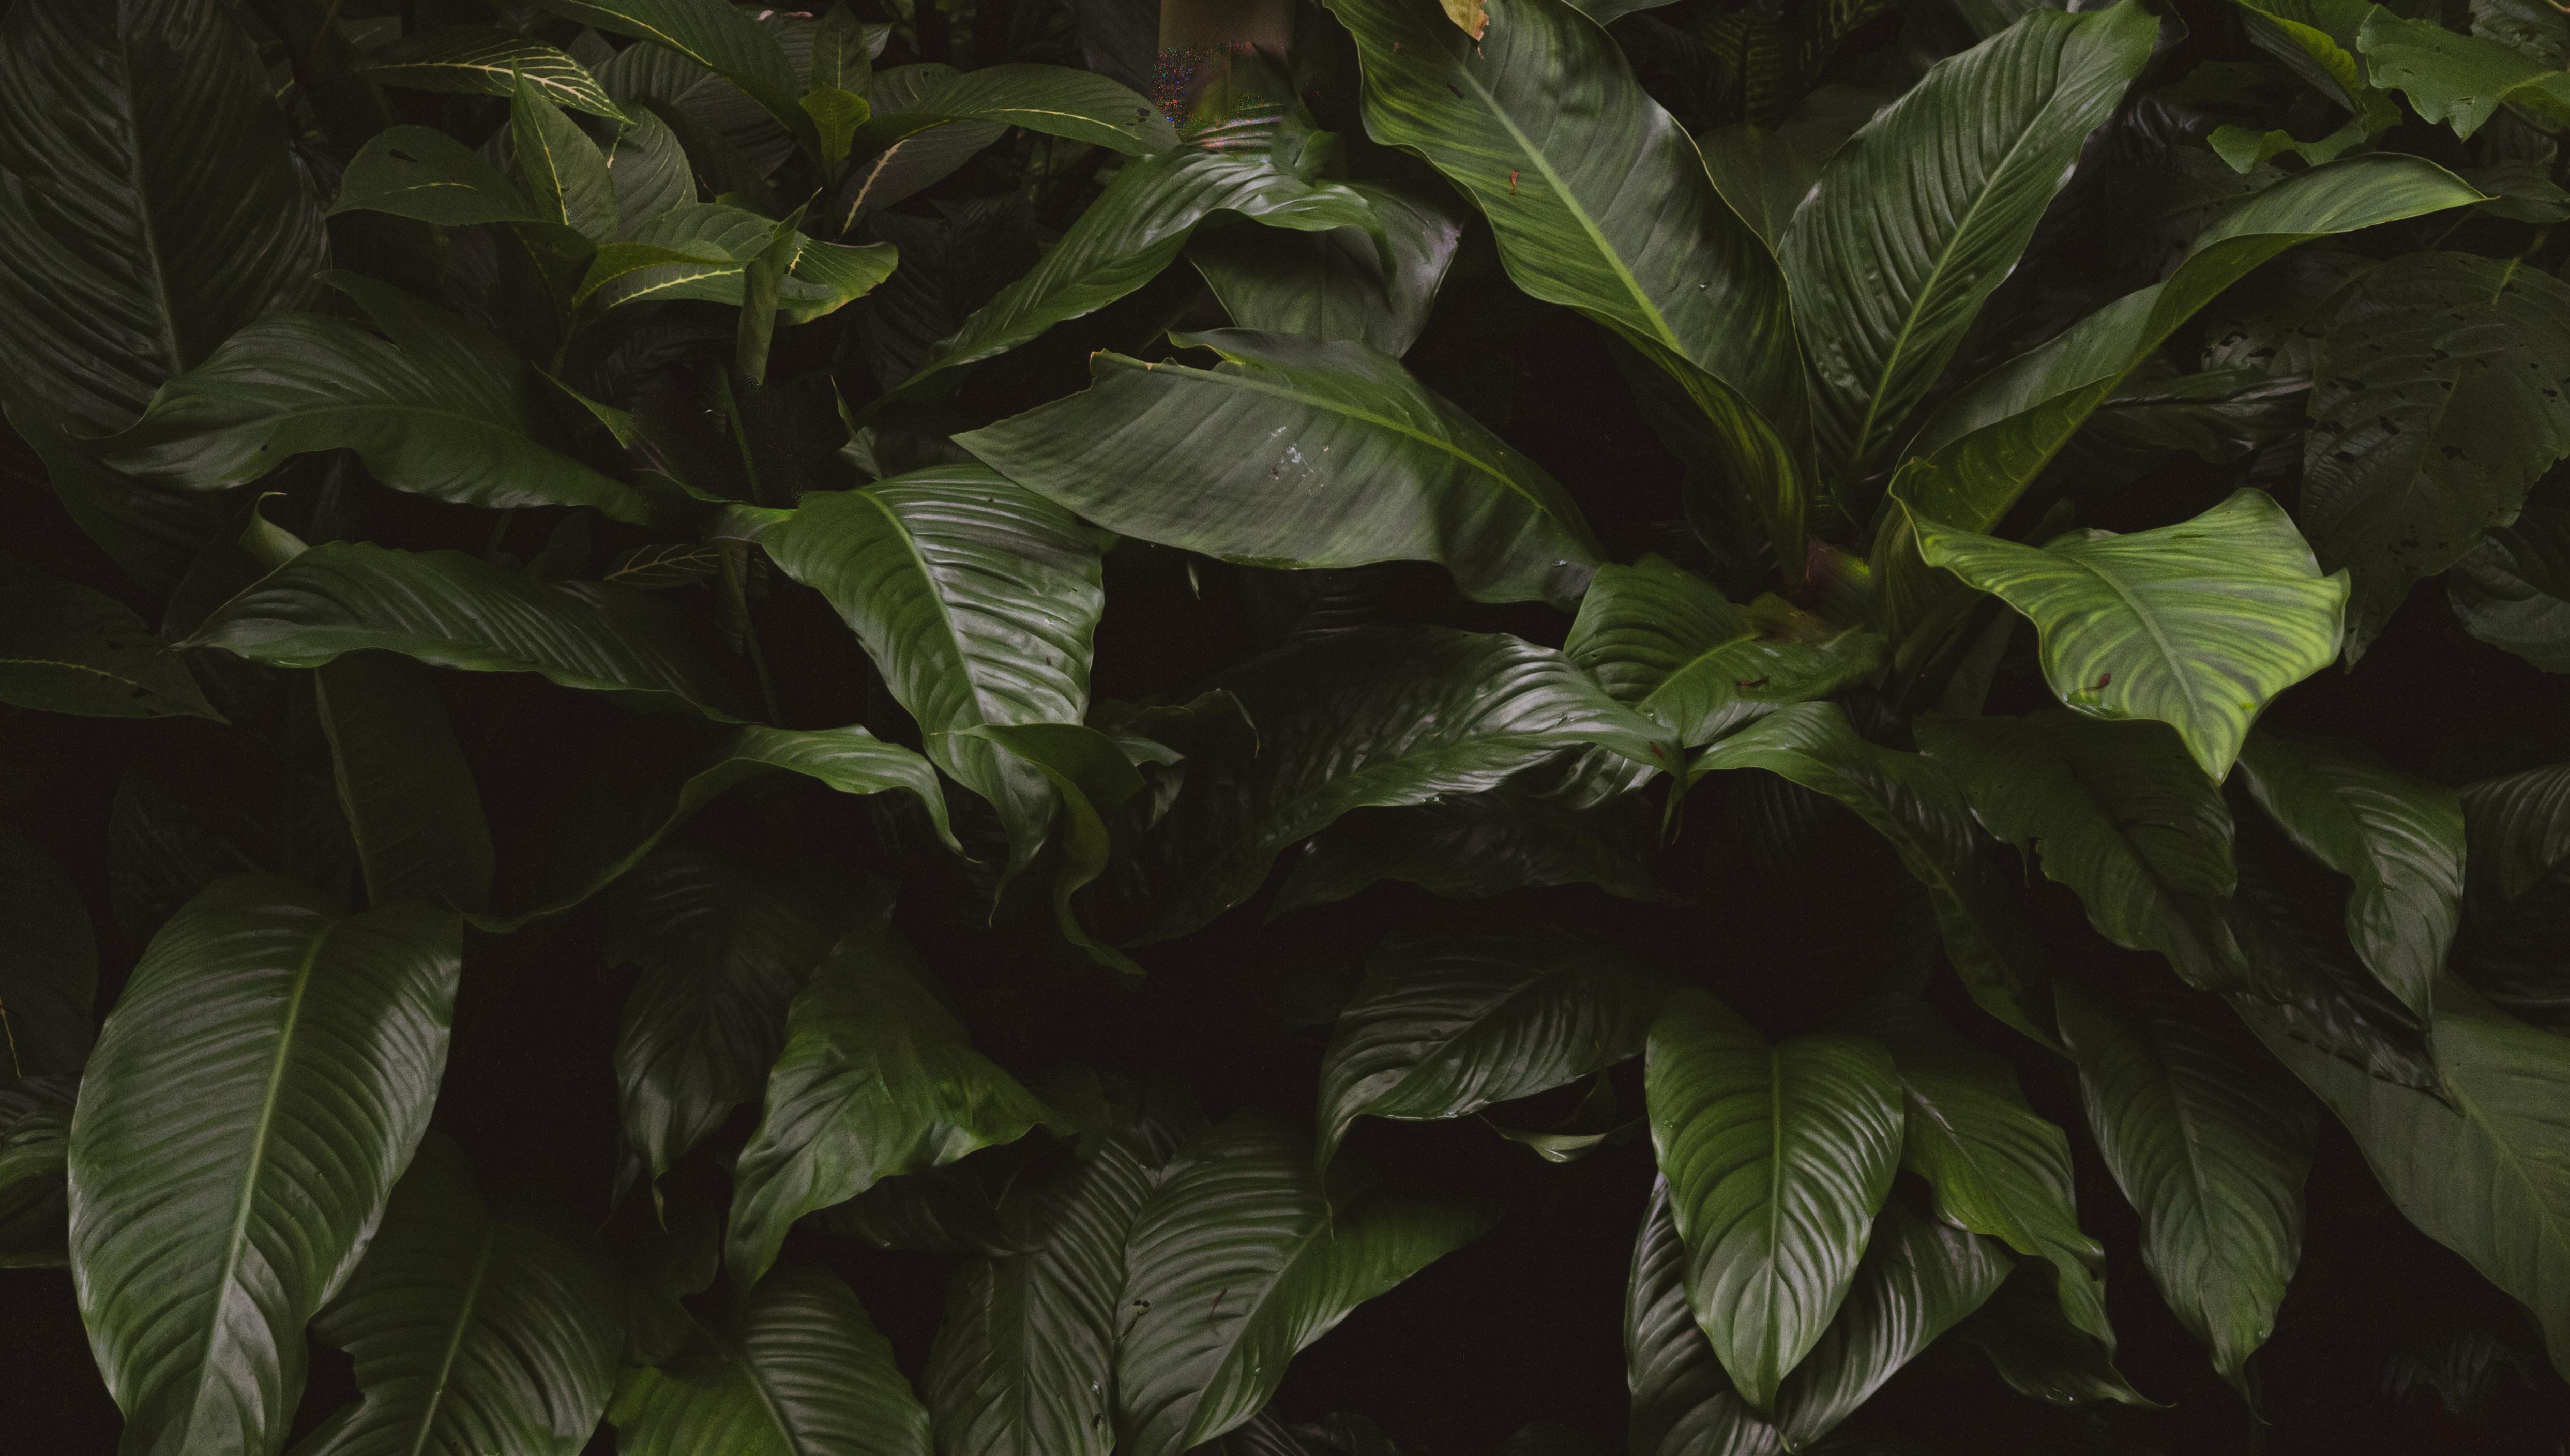 Dark jungle leaves tropical photo background